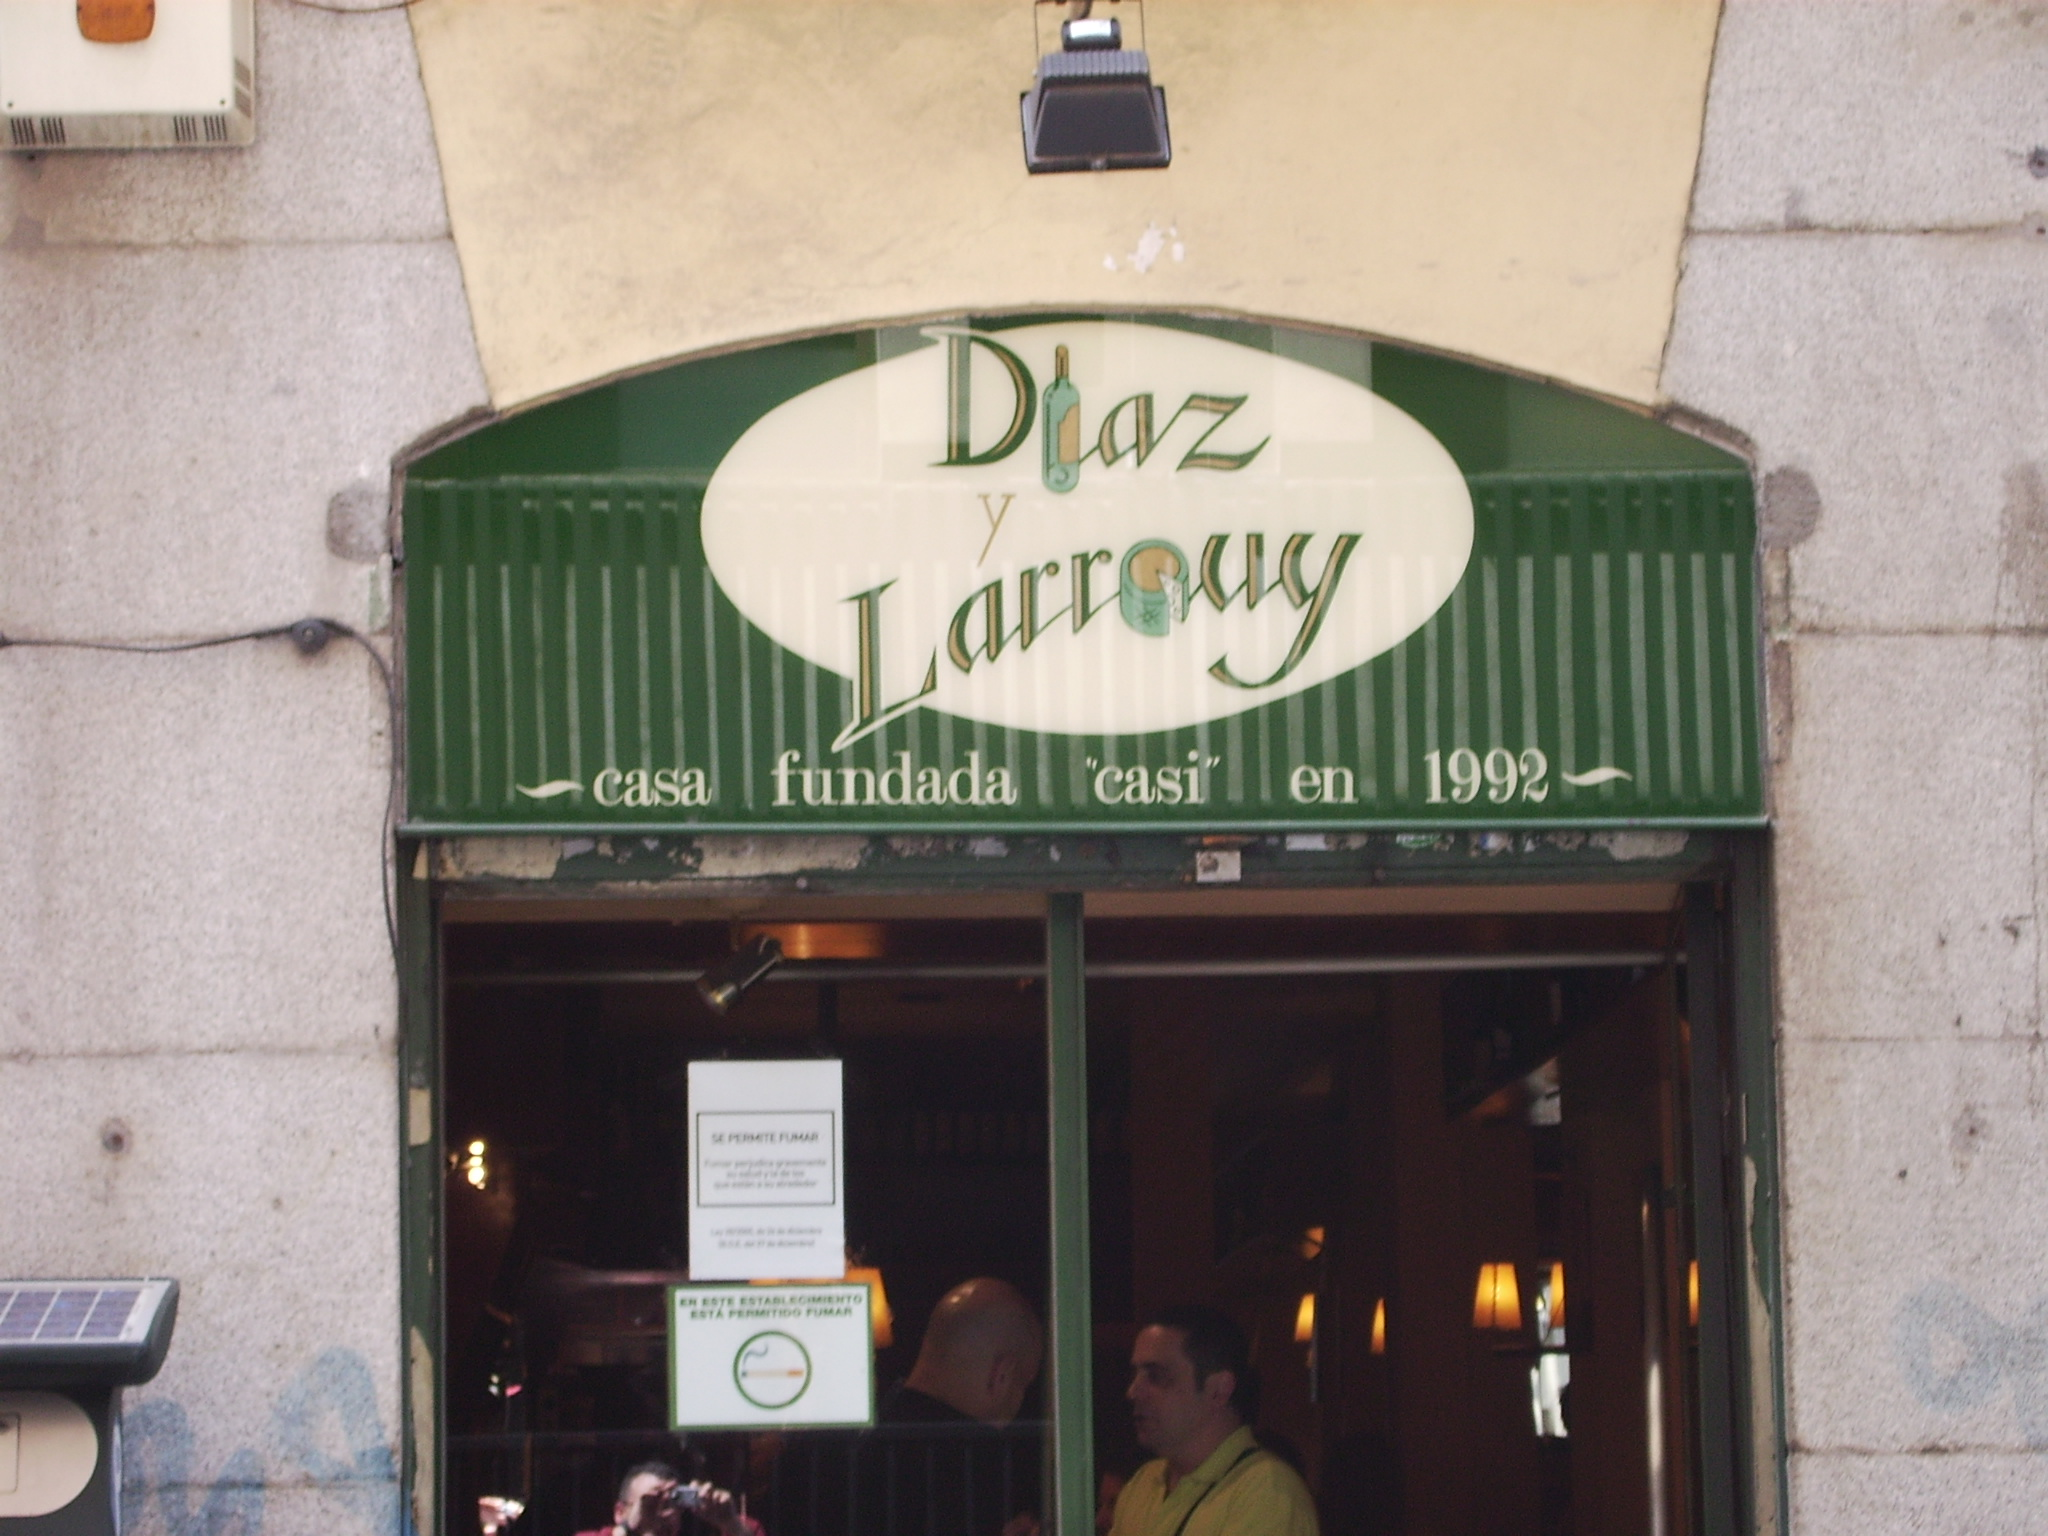 Diaz y Larrouy